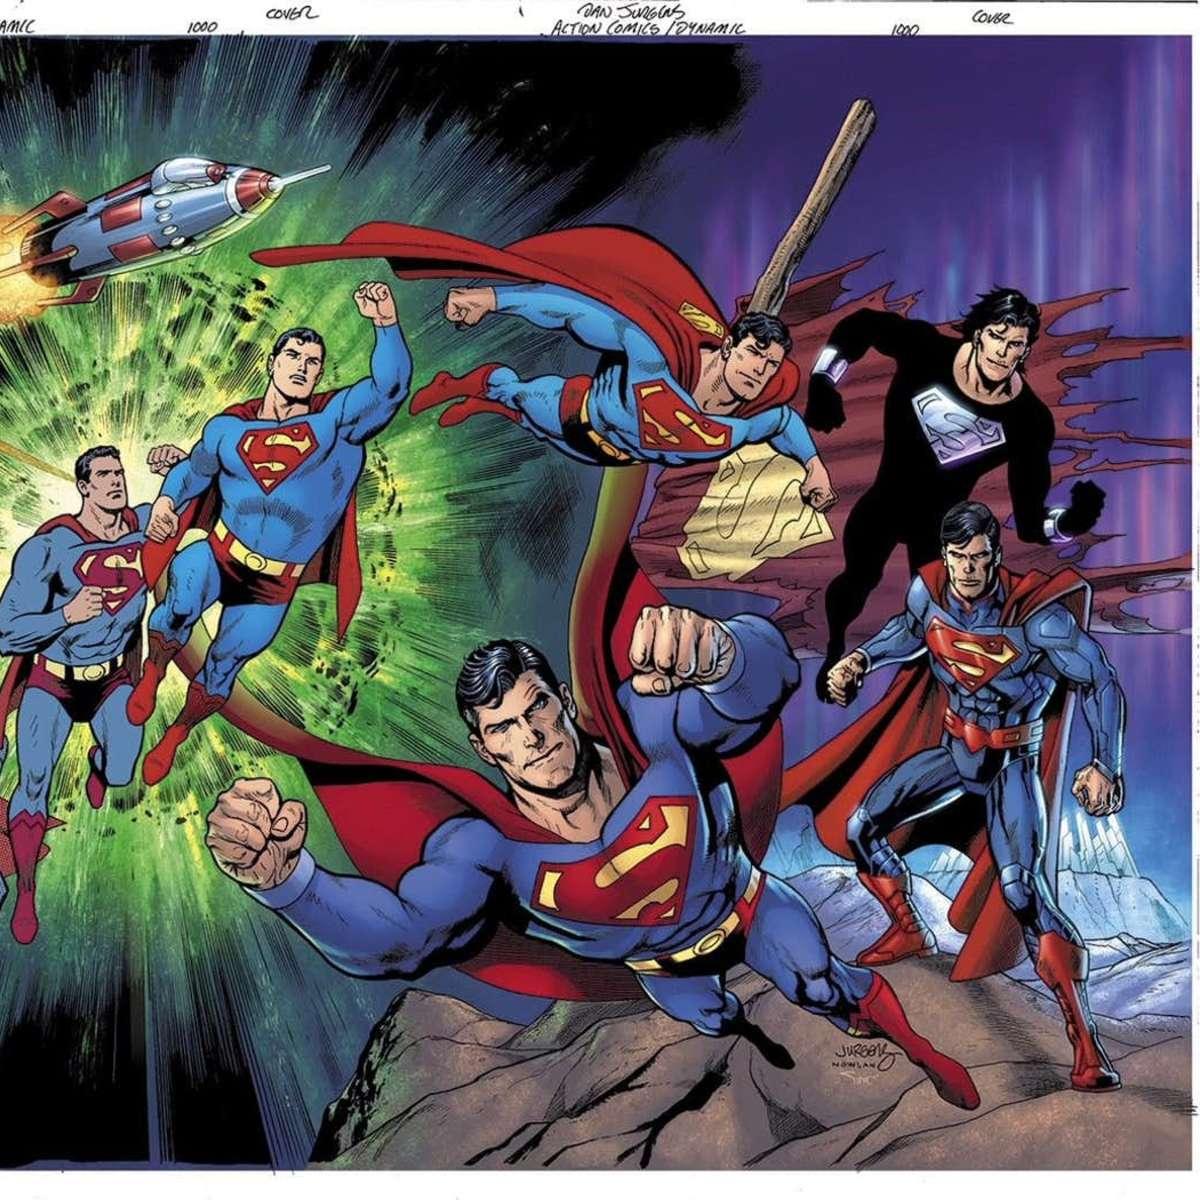 Action Comics #1000 Variant Cover by Dan Jurgens